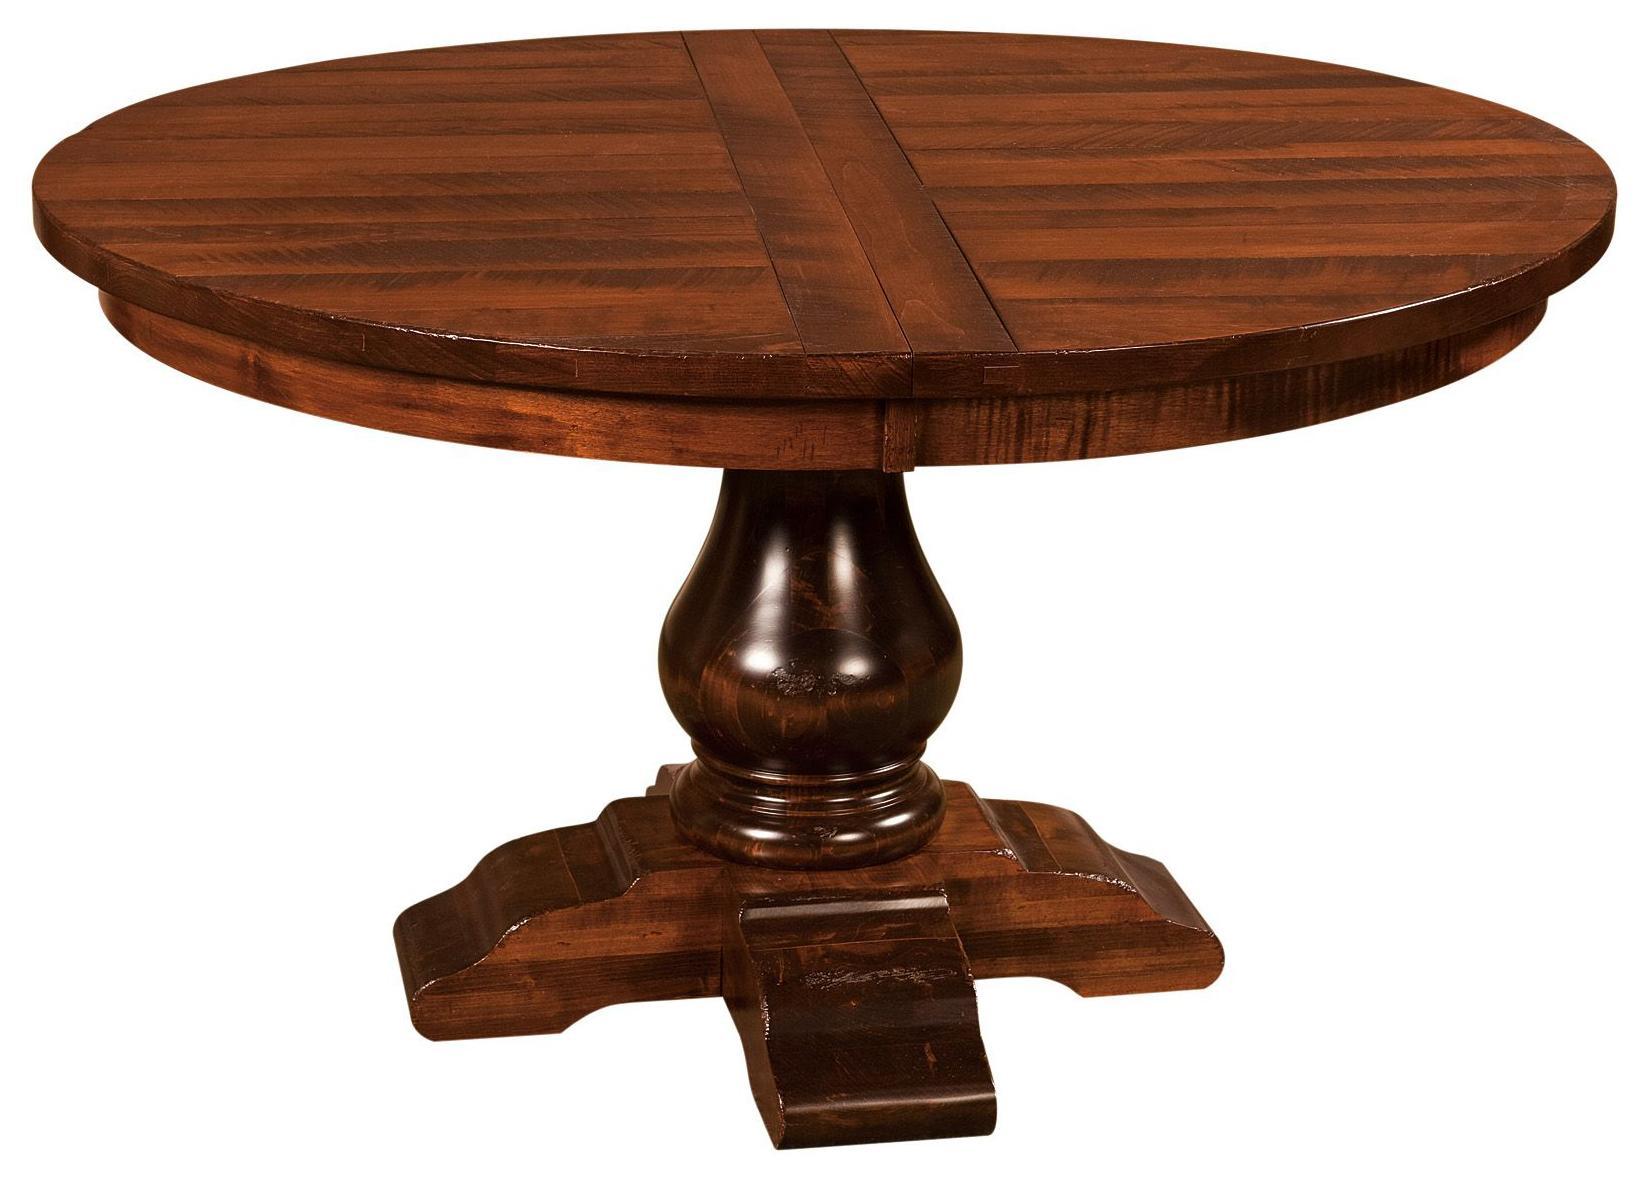 Webster Webster Amish Round Pedestal Table by Indiana Amish at Walker's Furniture